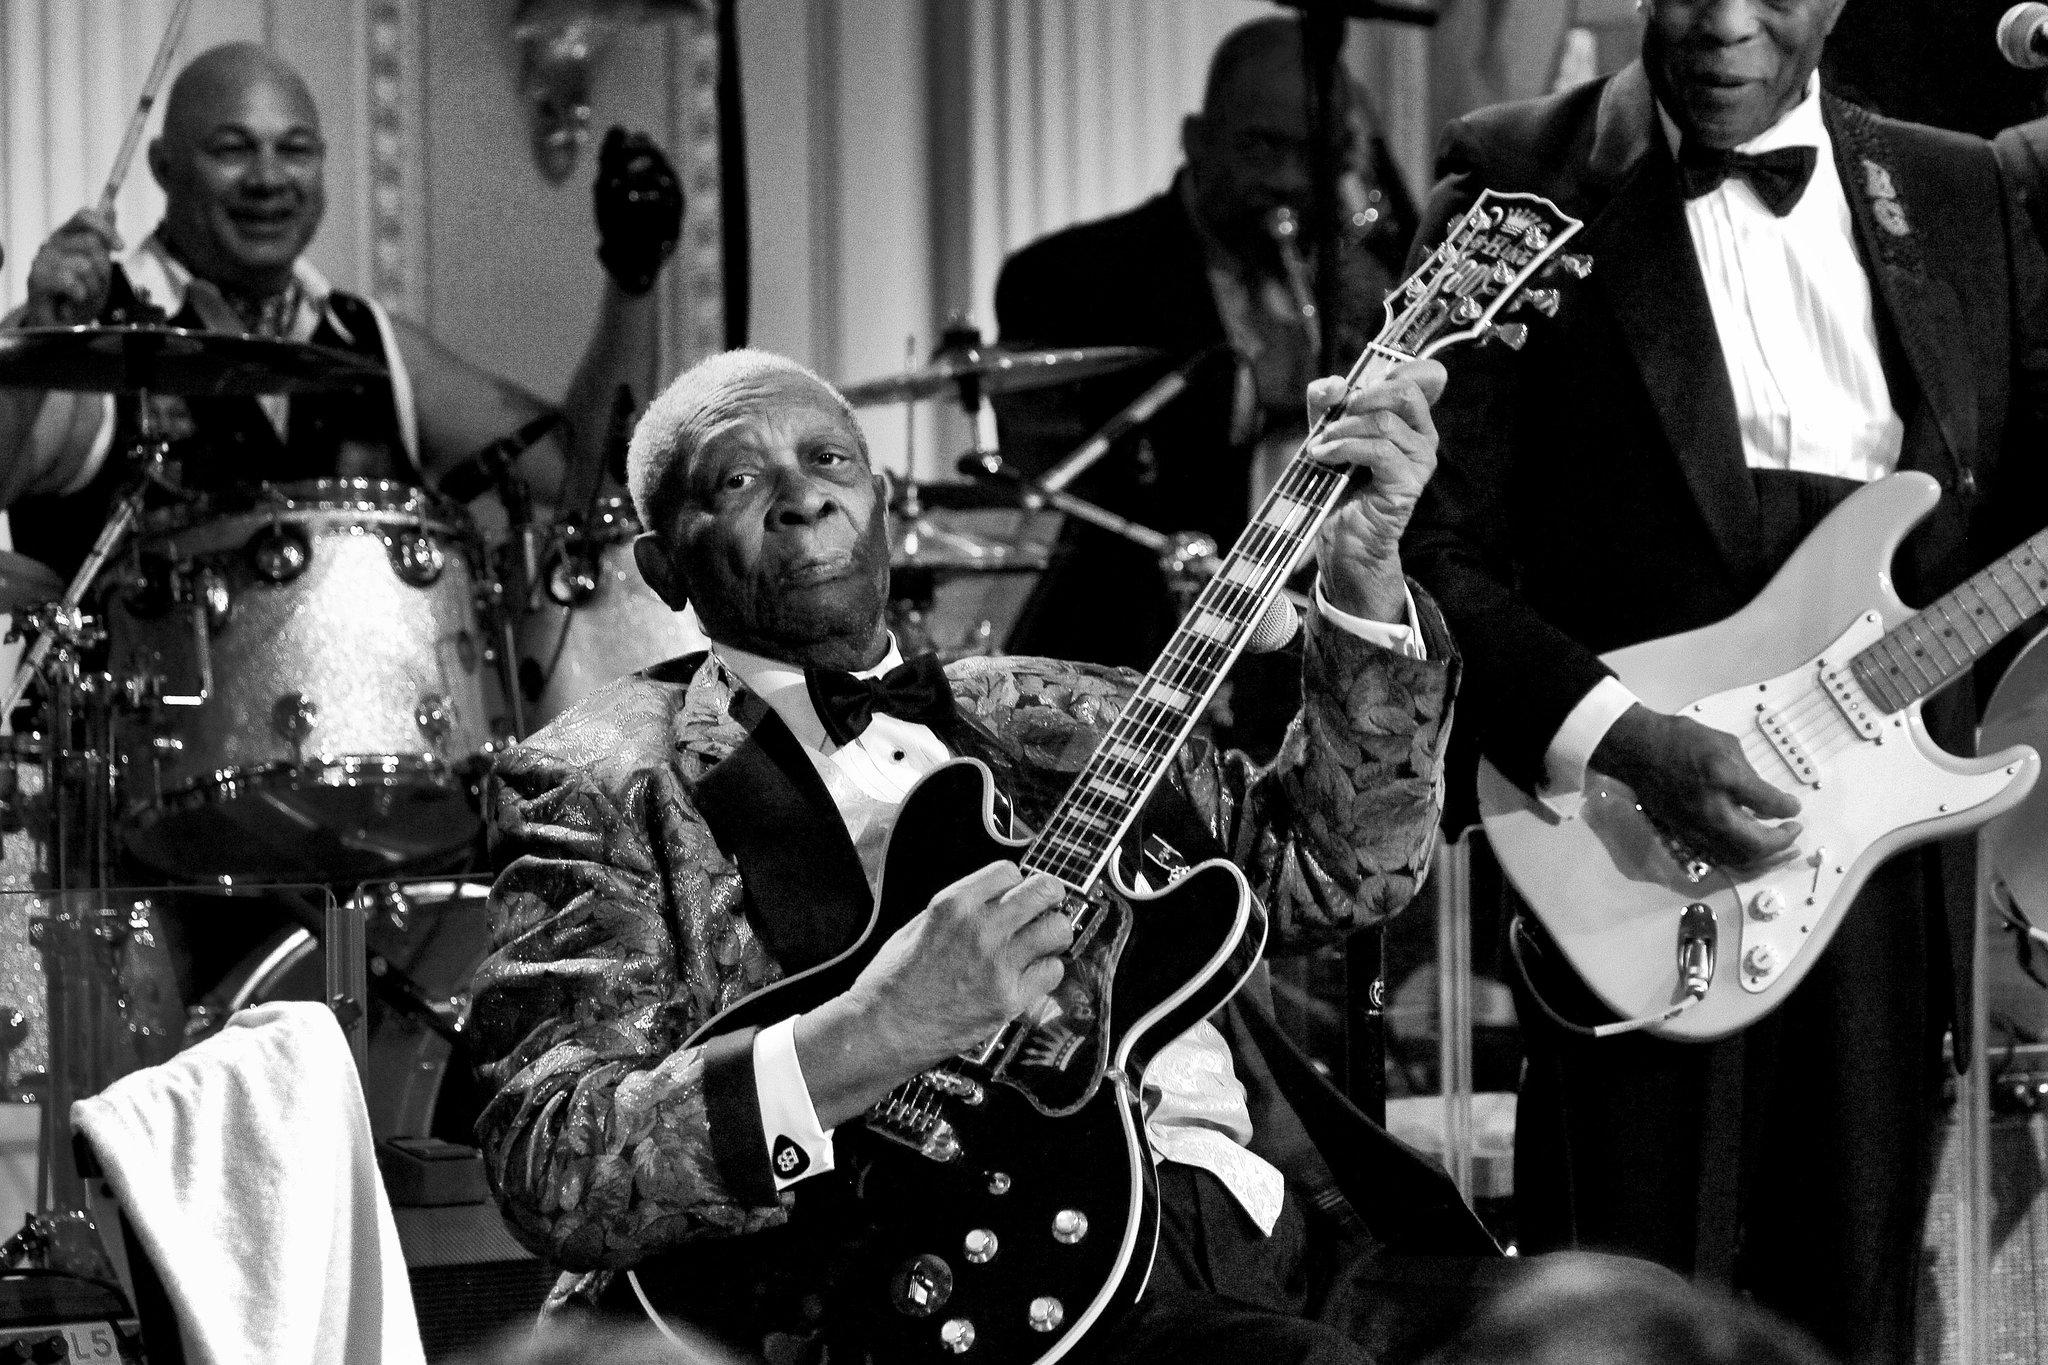 B B King Defining Bluesman For Generationss At 89